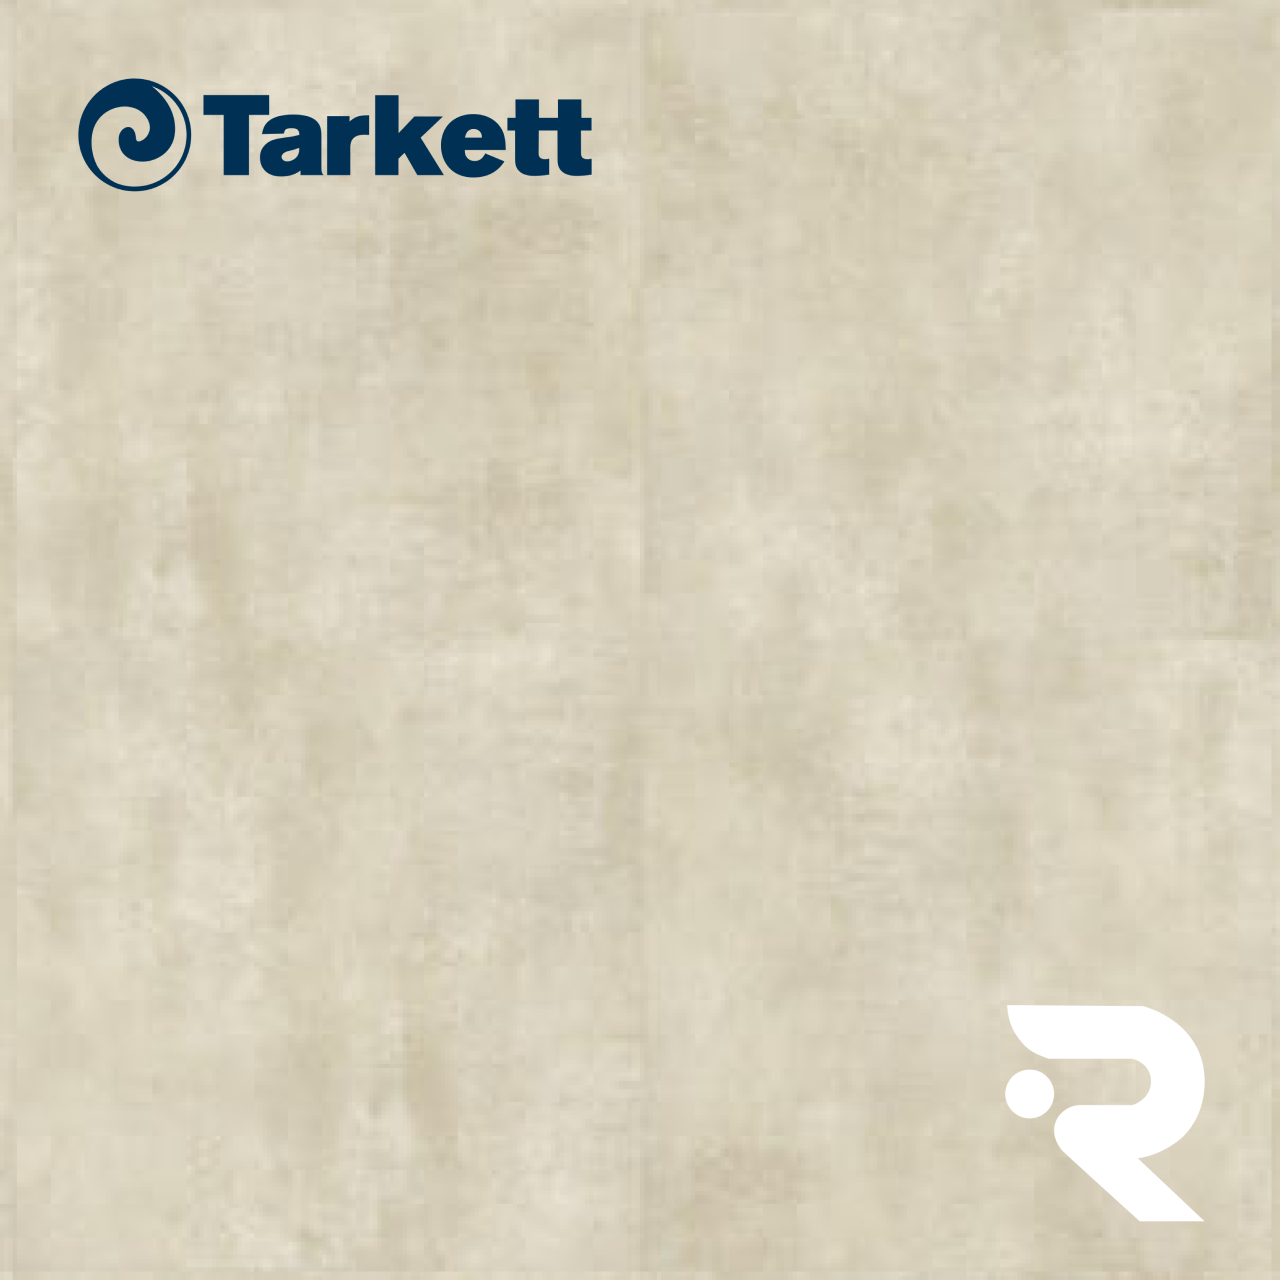 🌳 ПВХ плитка Tarkett | ModularT 7 - BETON BEIGE | Art Vinyl | 600 x 600 мм